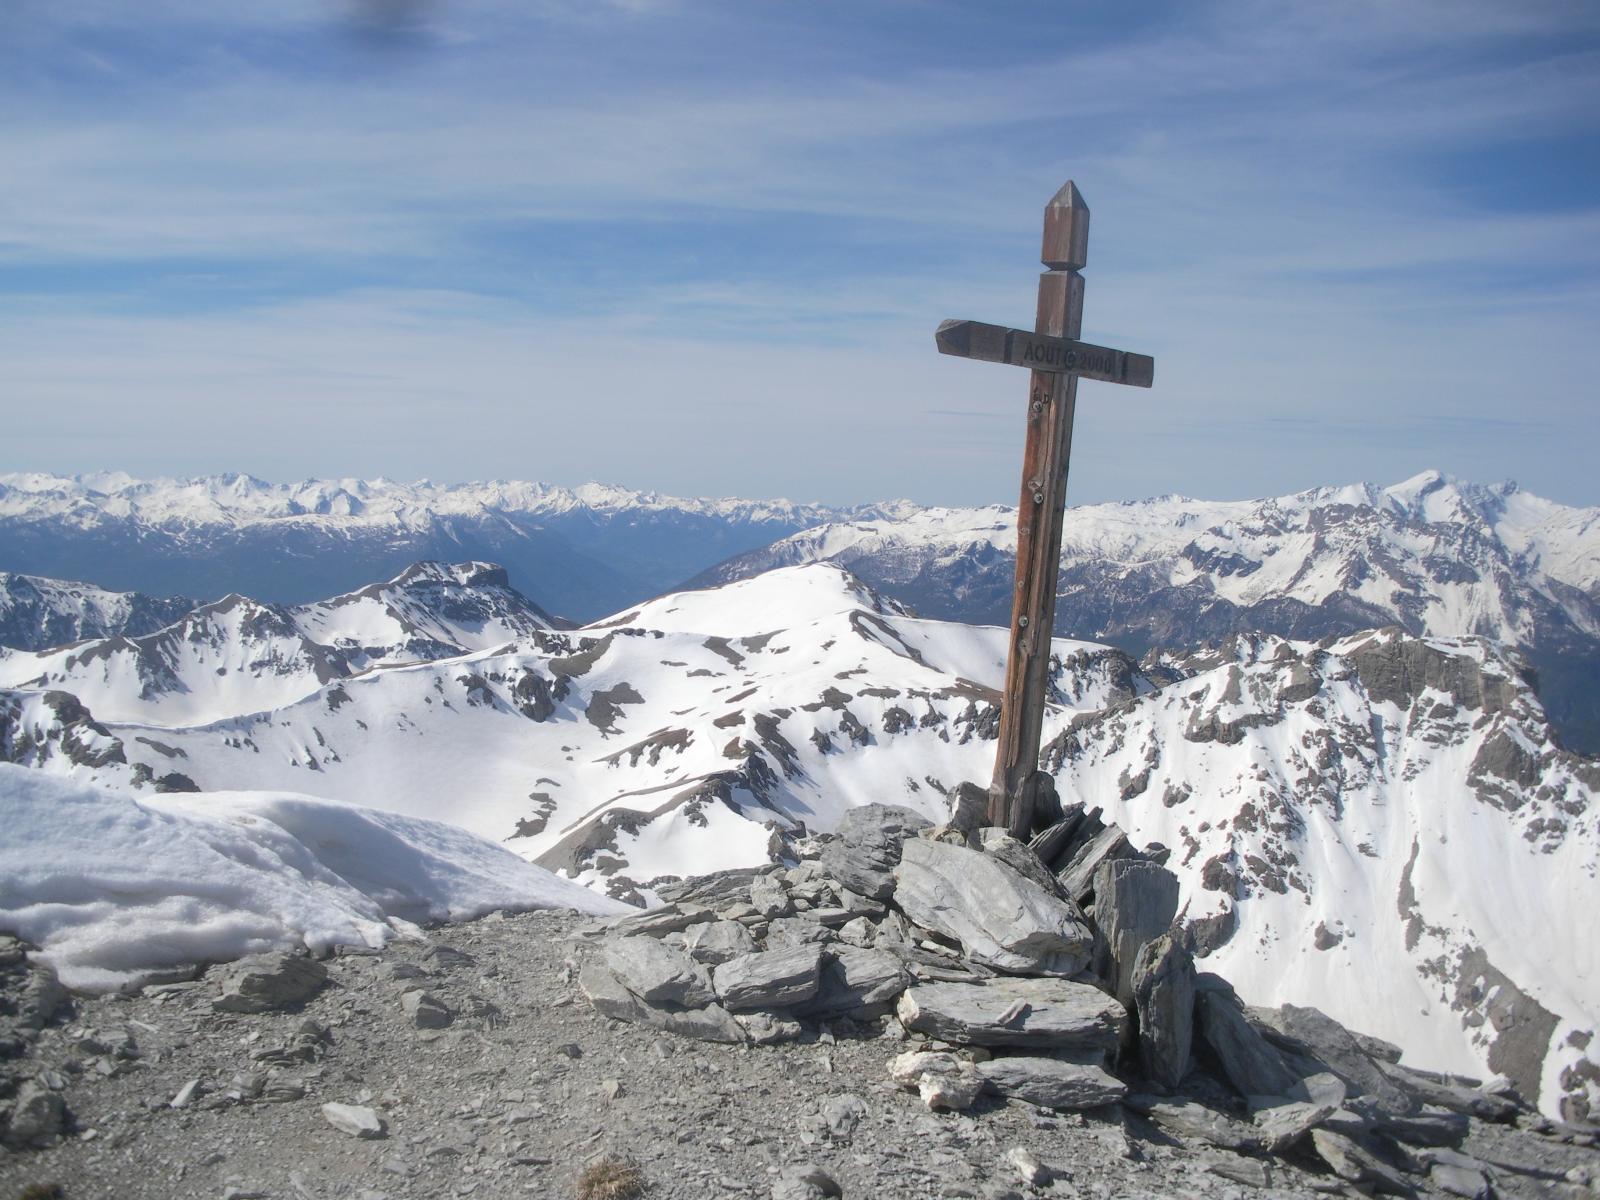 L'Alpavin dal Pic de Peyre Eyraute..